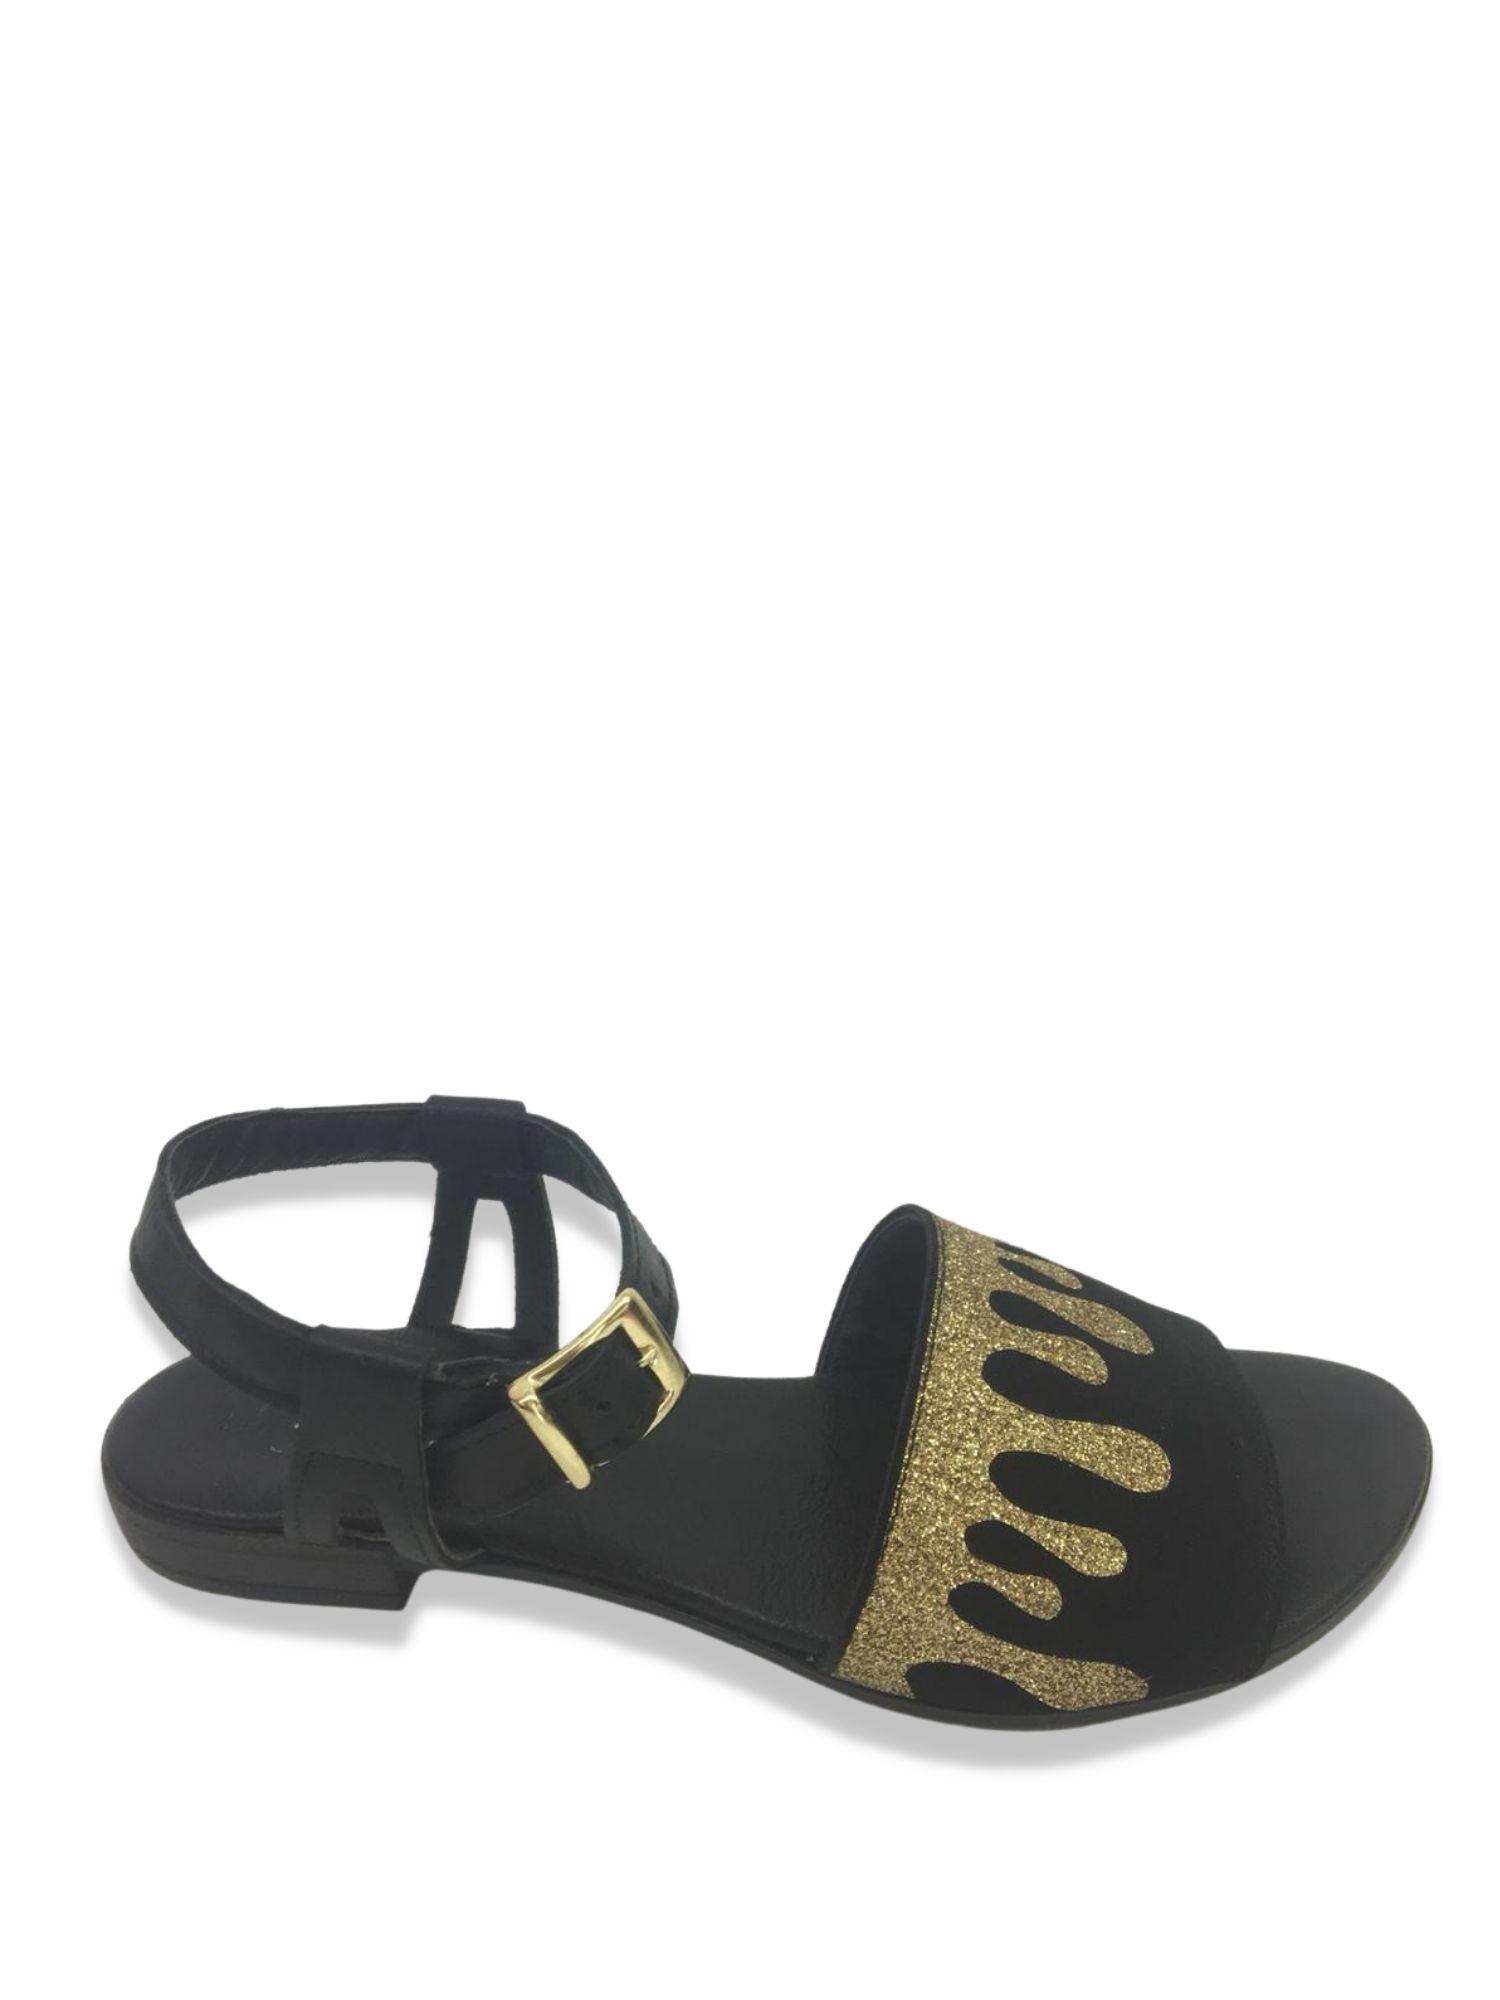 Sandalo Made in Italy 201 Nero/Oro